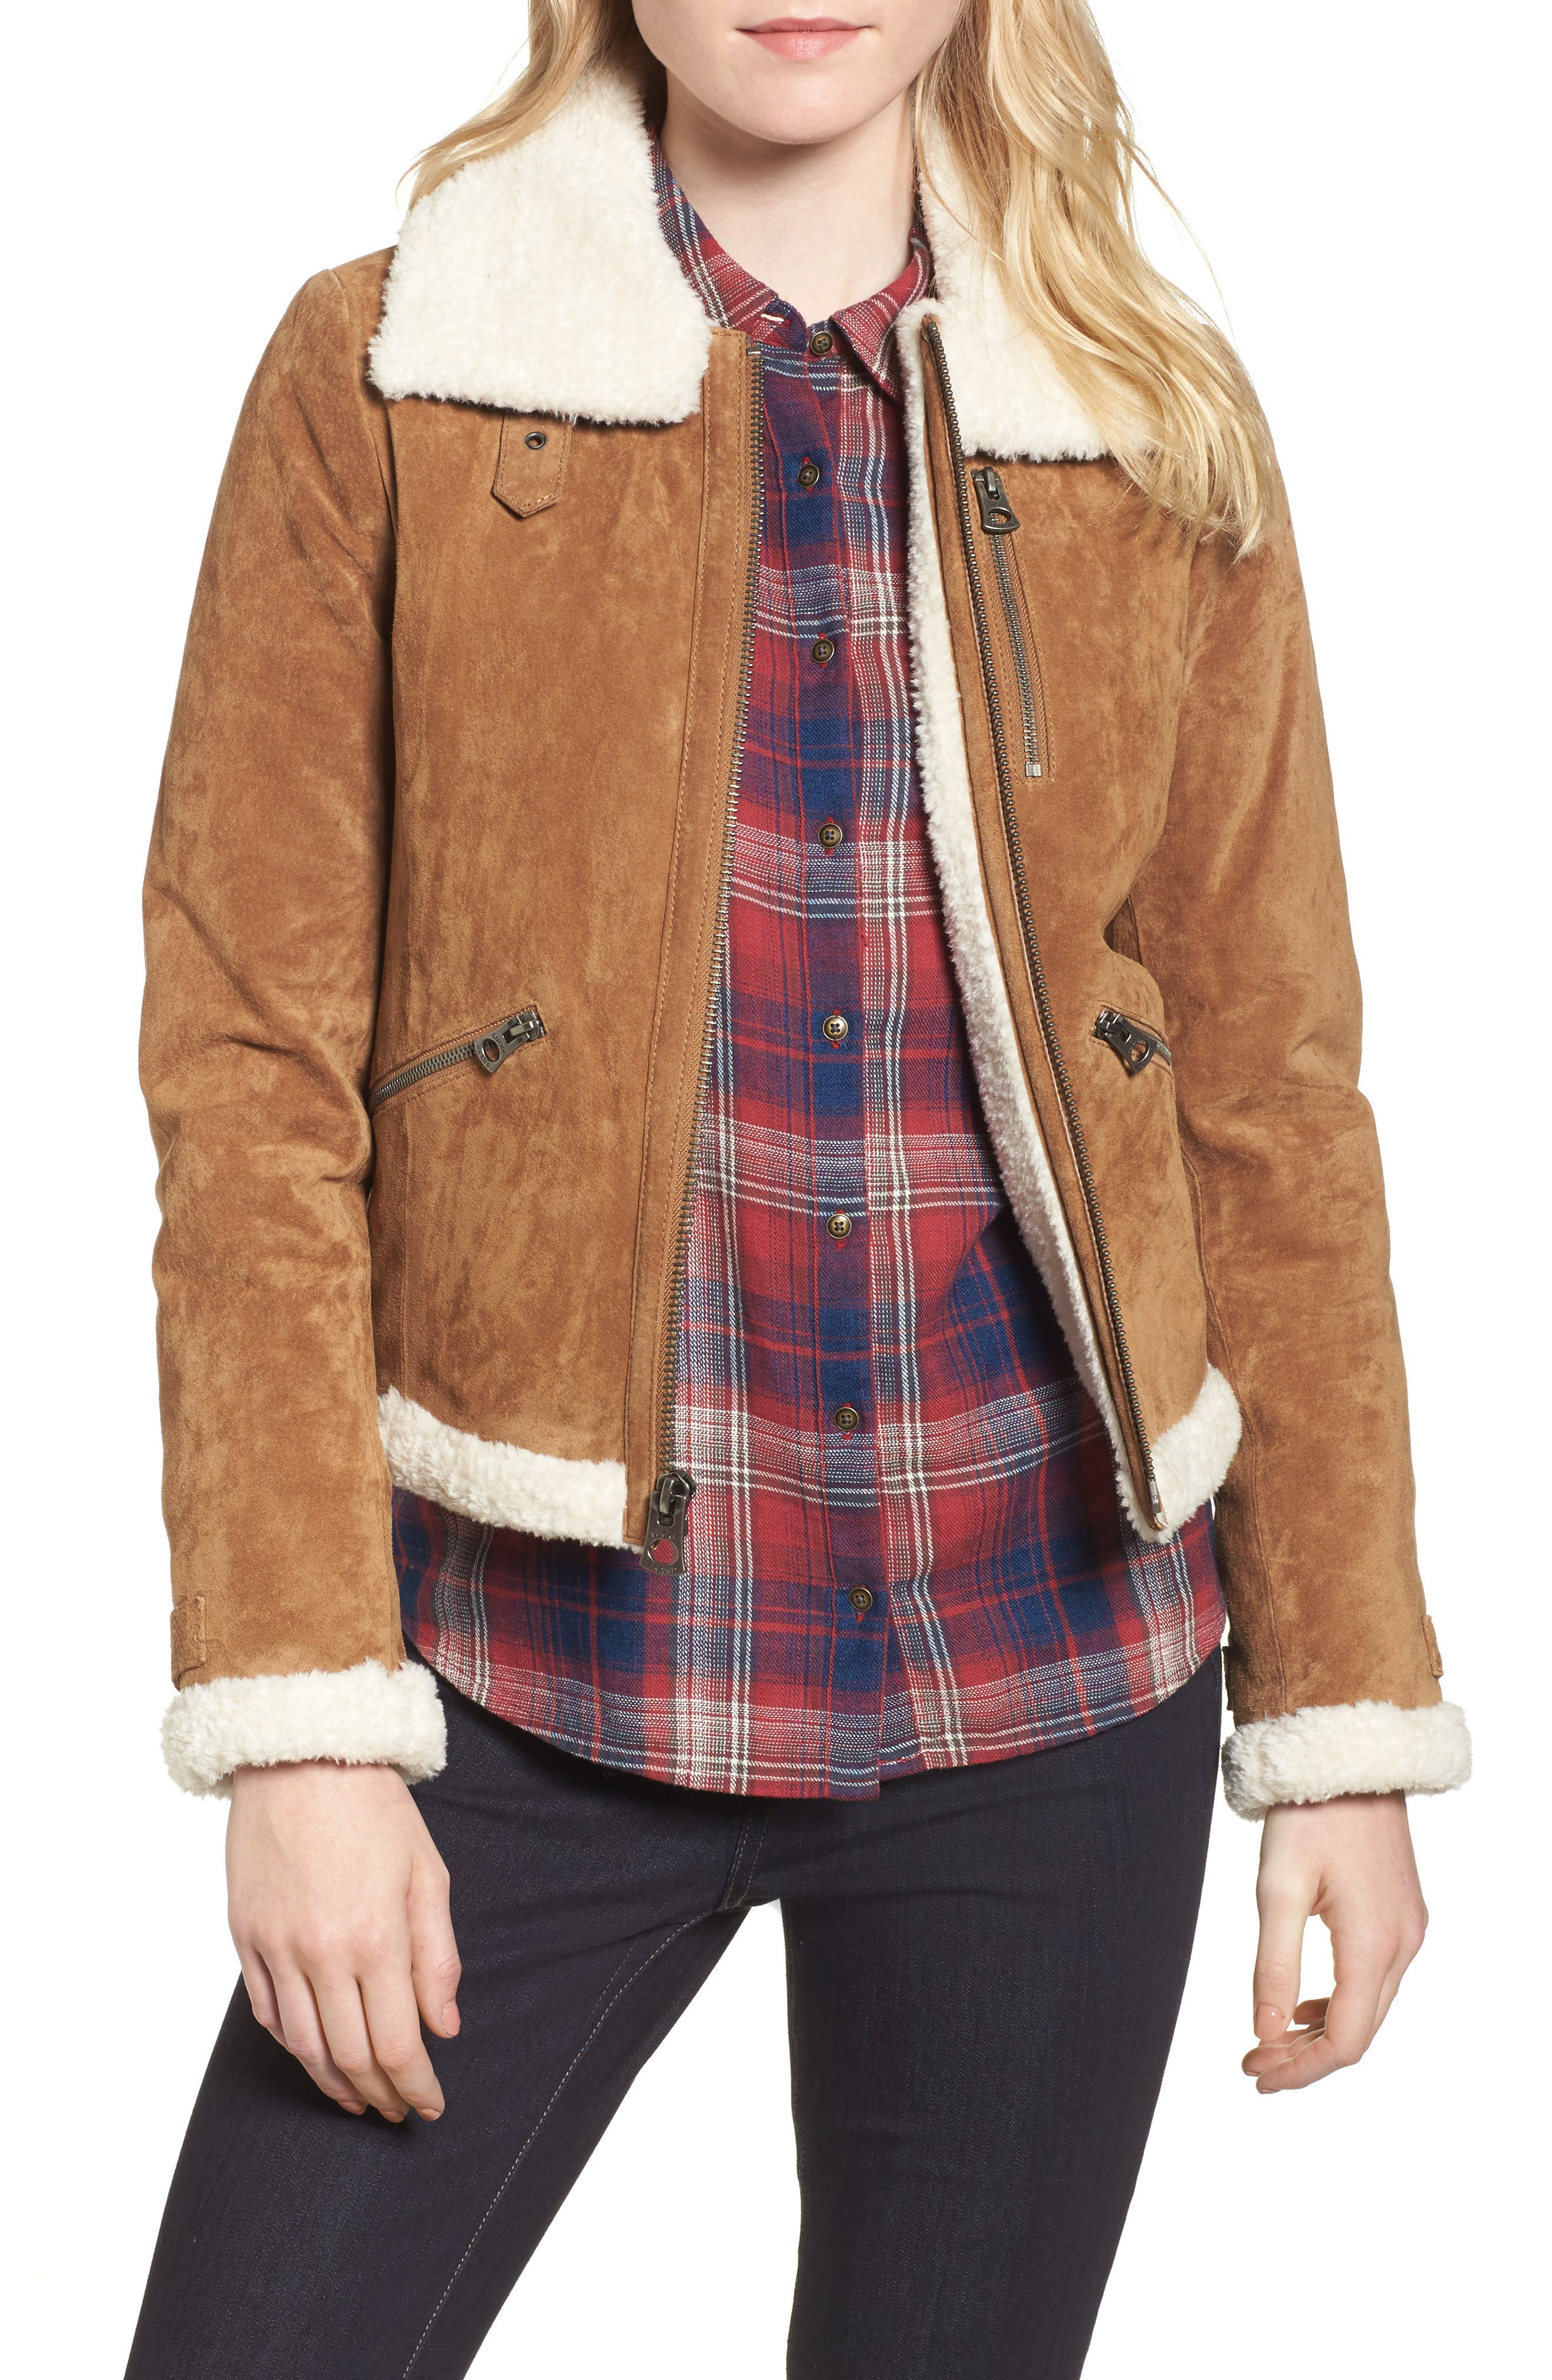 Leather Jacket with Faux Fur Trim,                             Main thumbnail 1, color,                             Chestnut